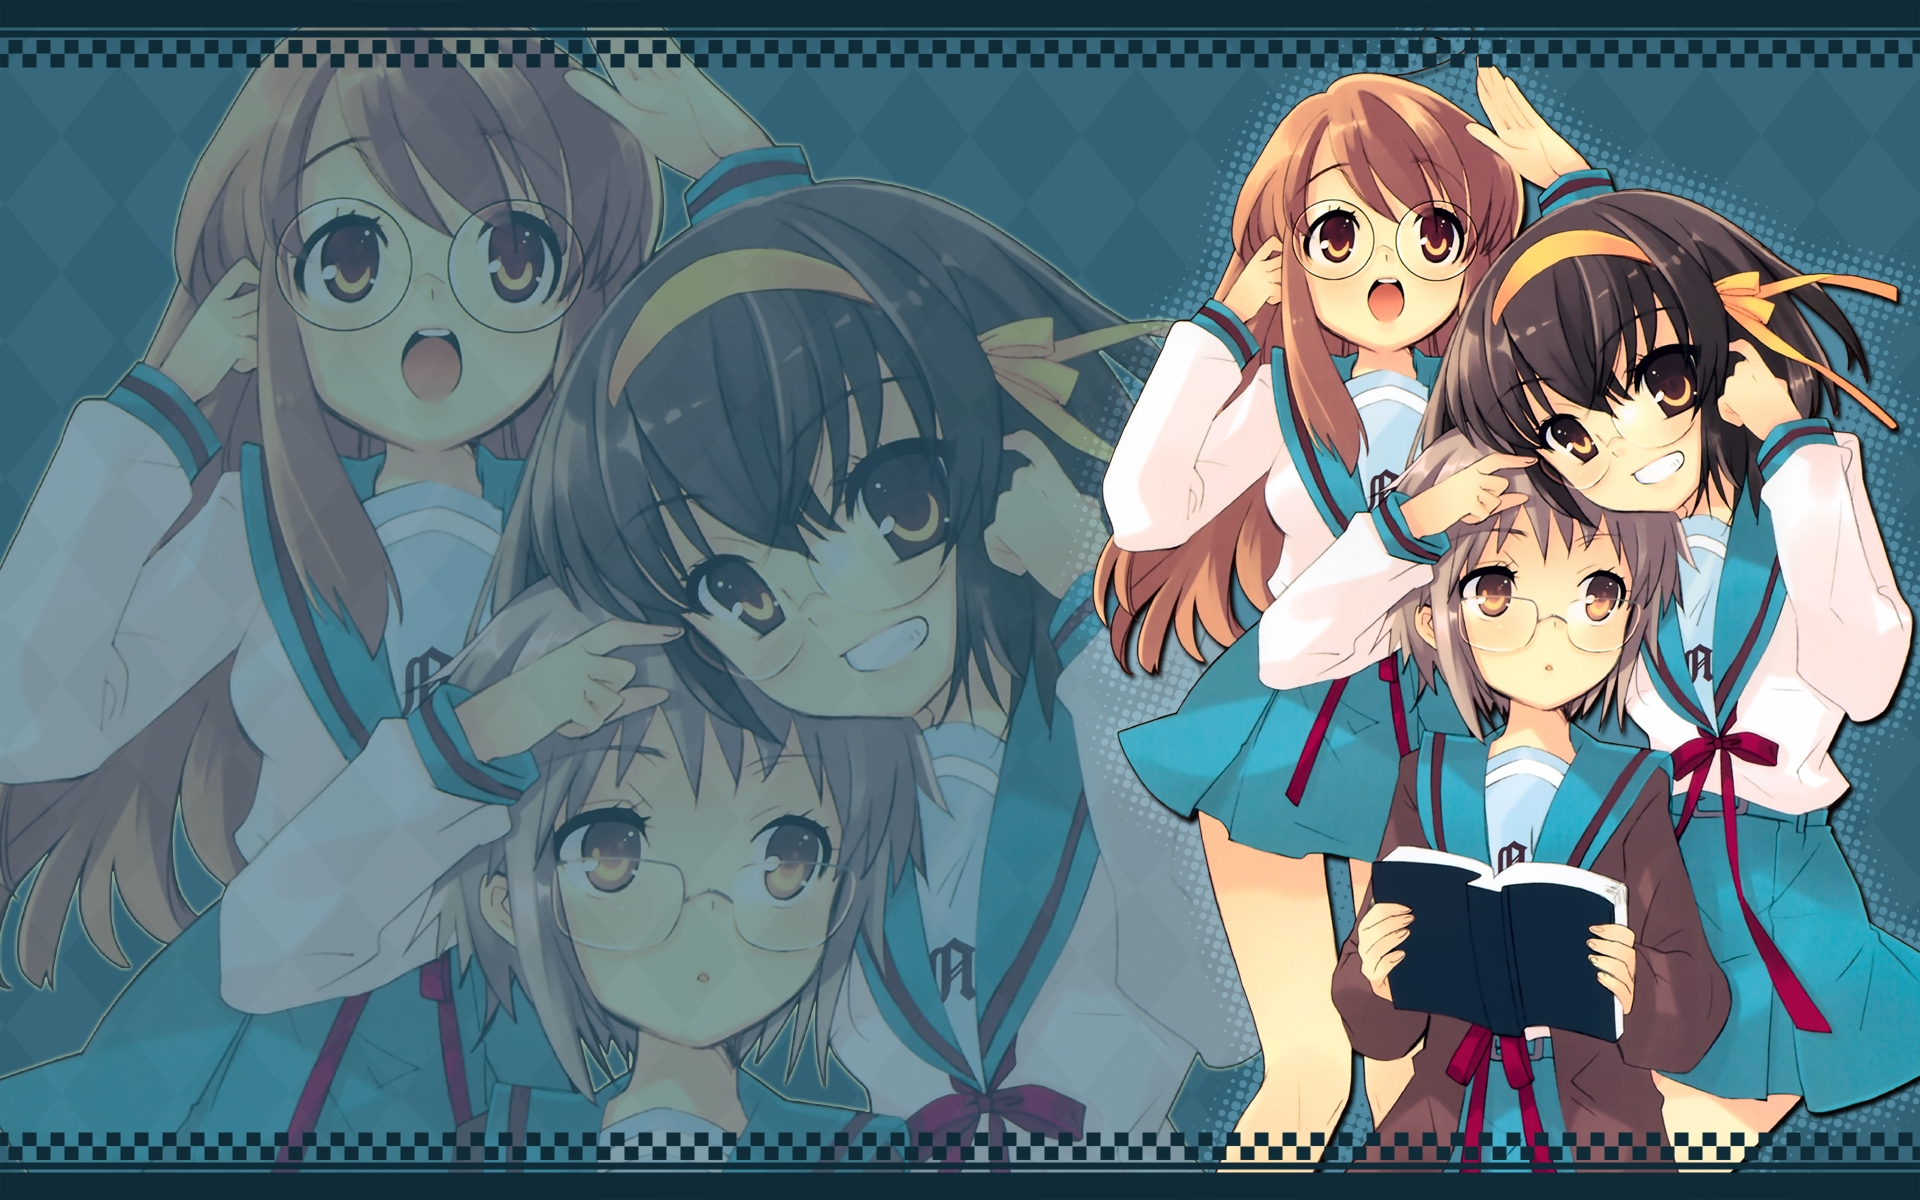 Free Download The Melancholy Of Haruhi Suzumiya Full Hd Wallpaper